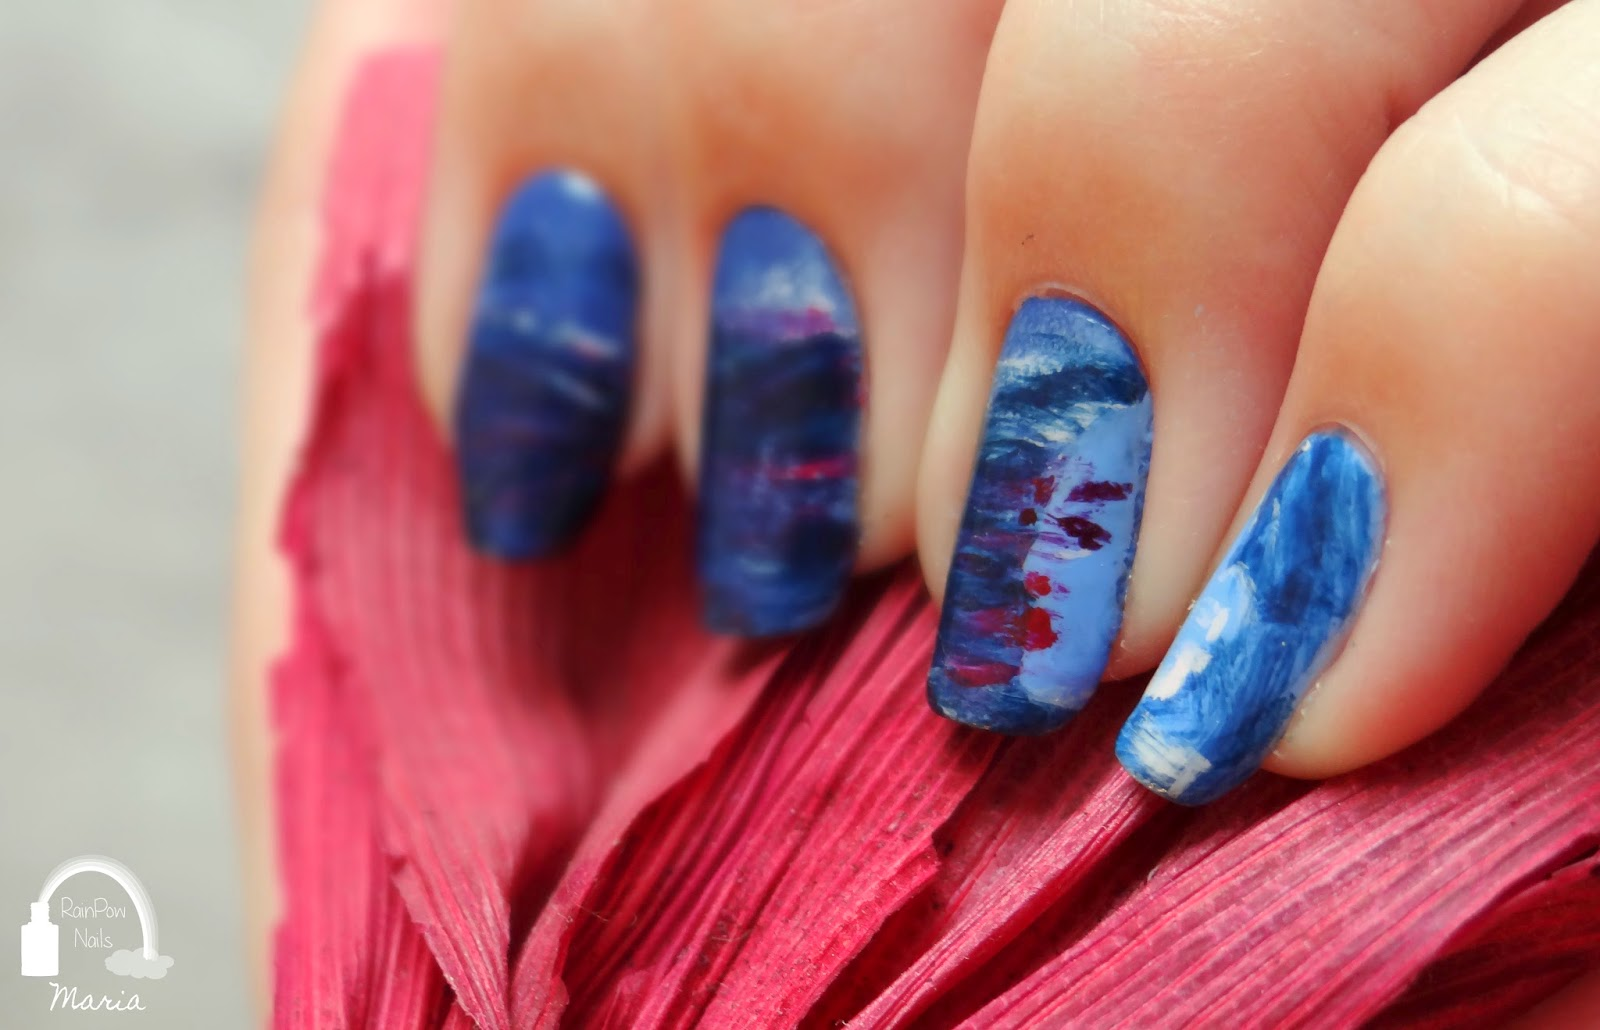 RainPow Nails: Mai 2014